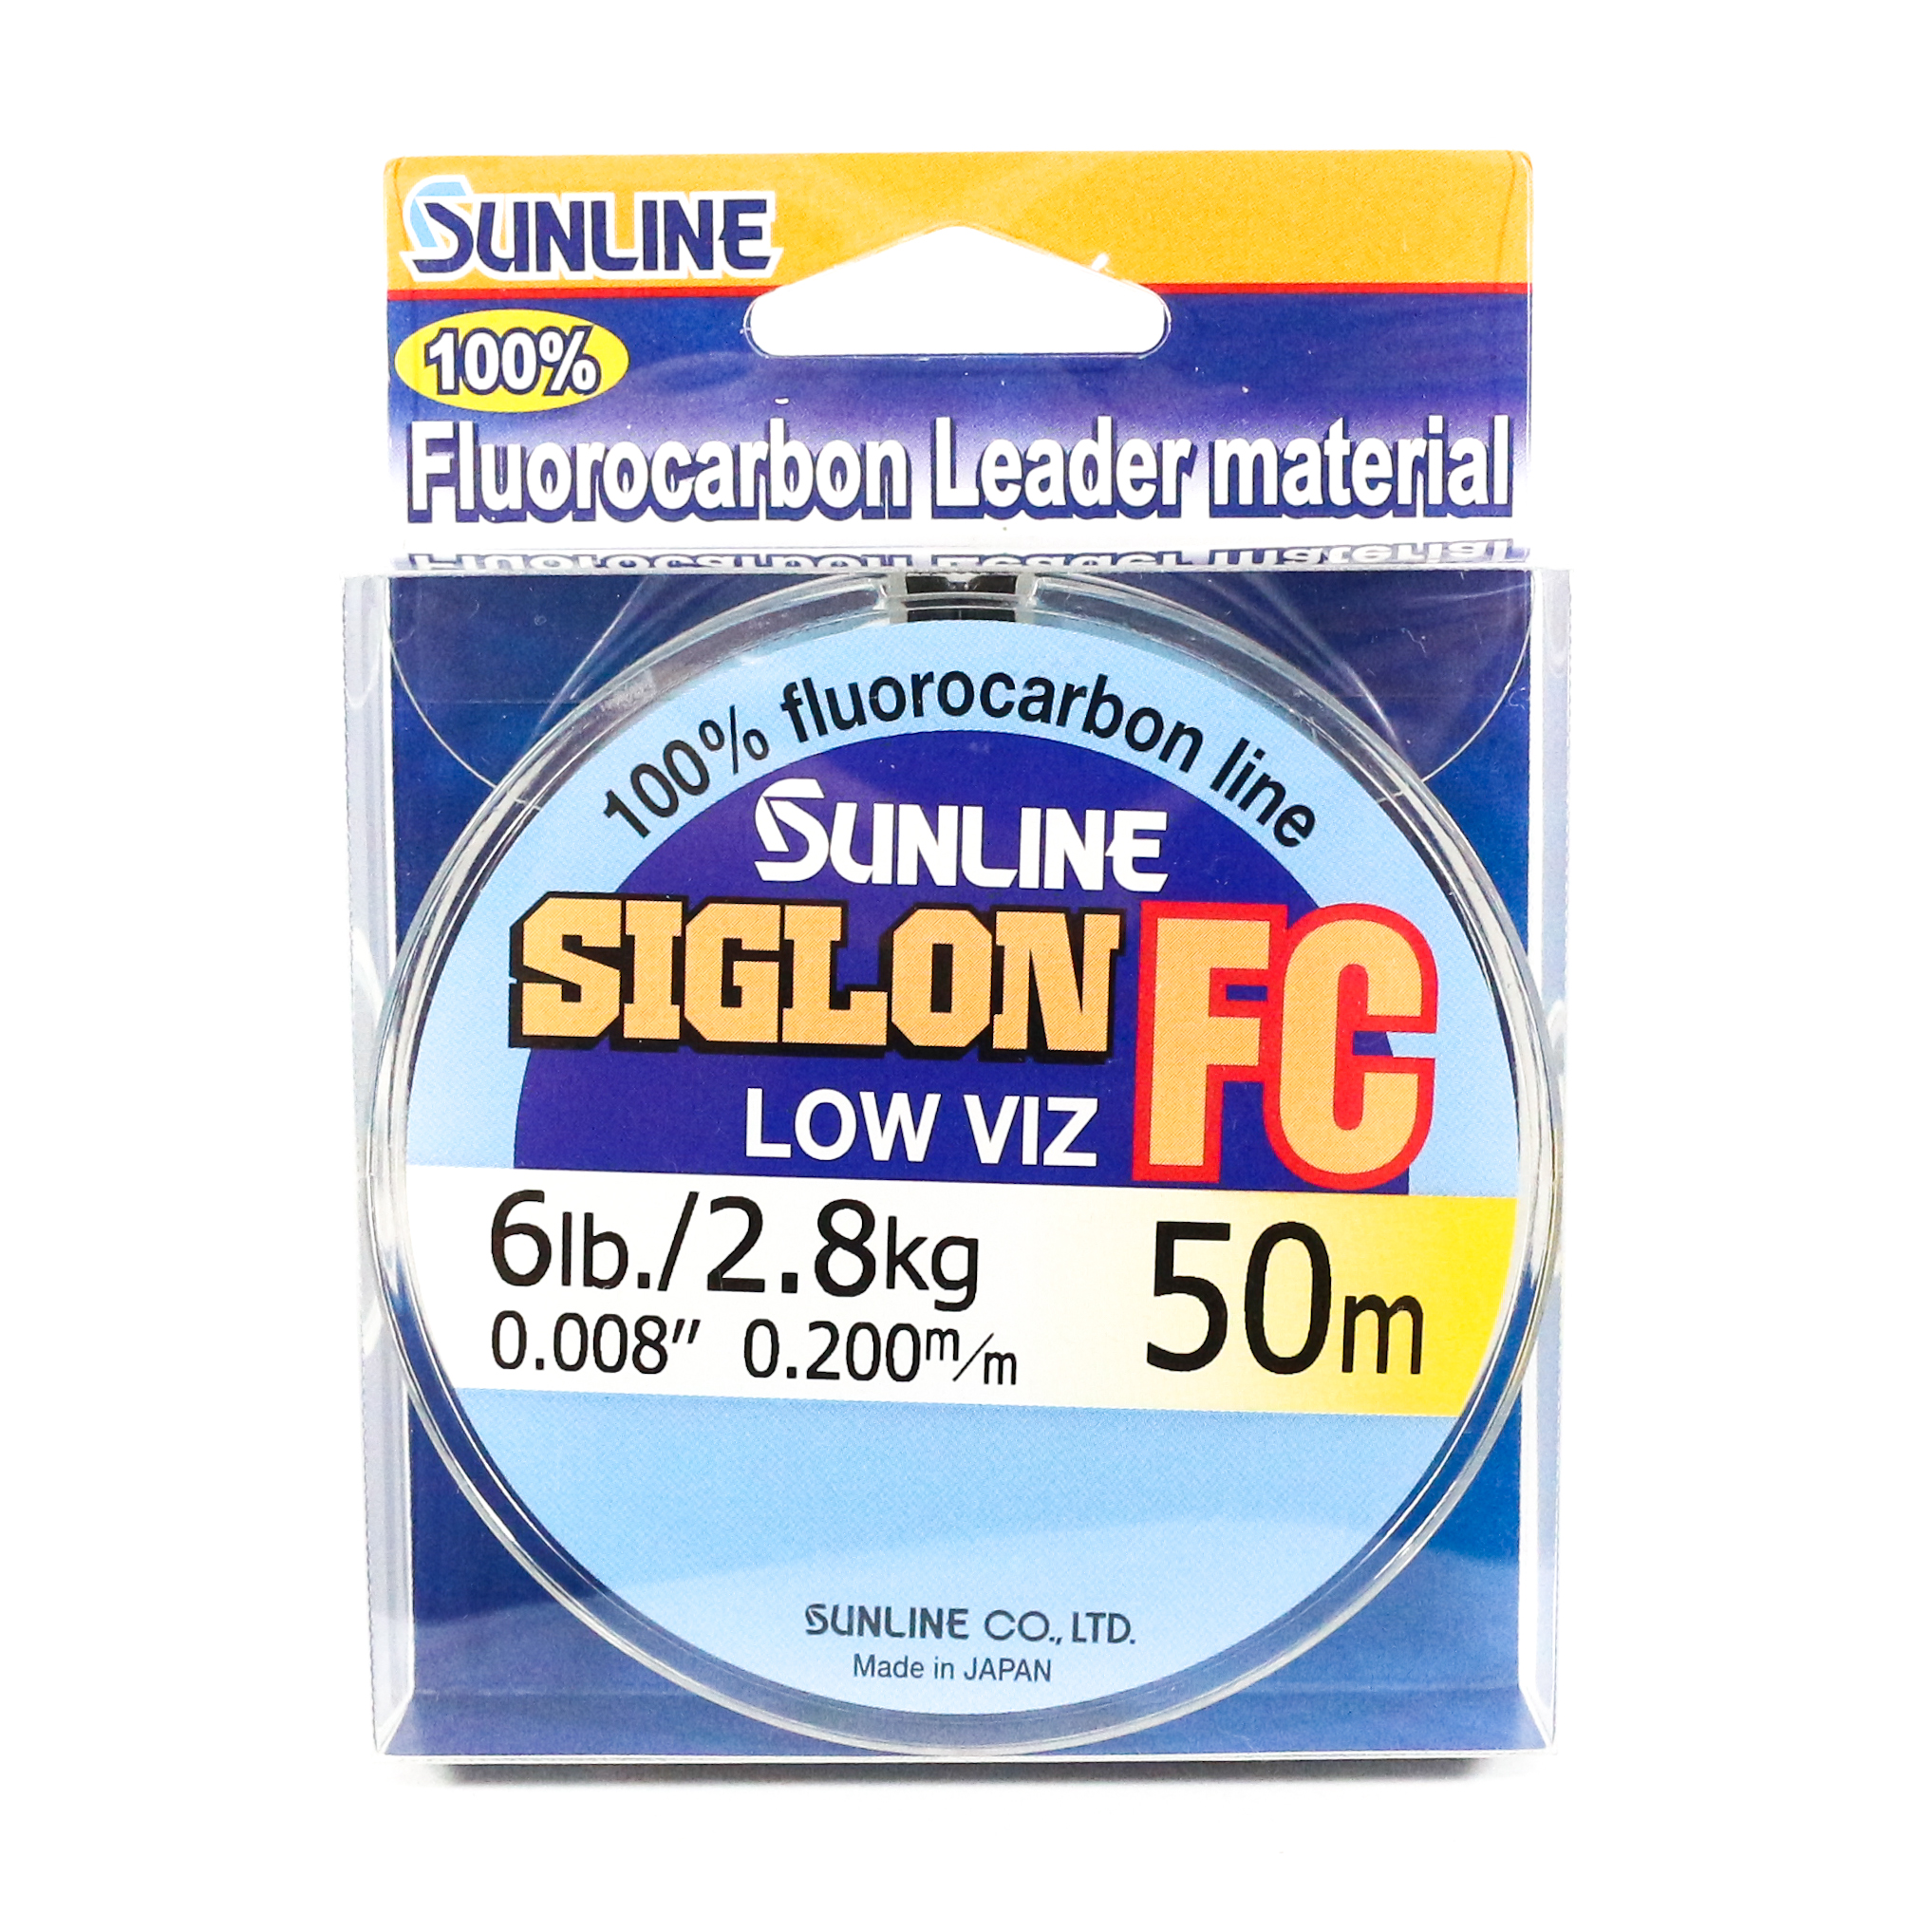 Sunline Siglon FC Fluorocarbon Line 50m 6lb Diameter 0.2 mm (5822)